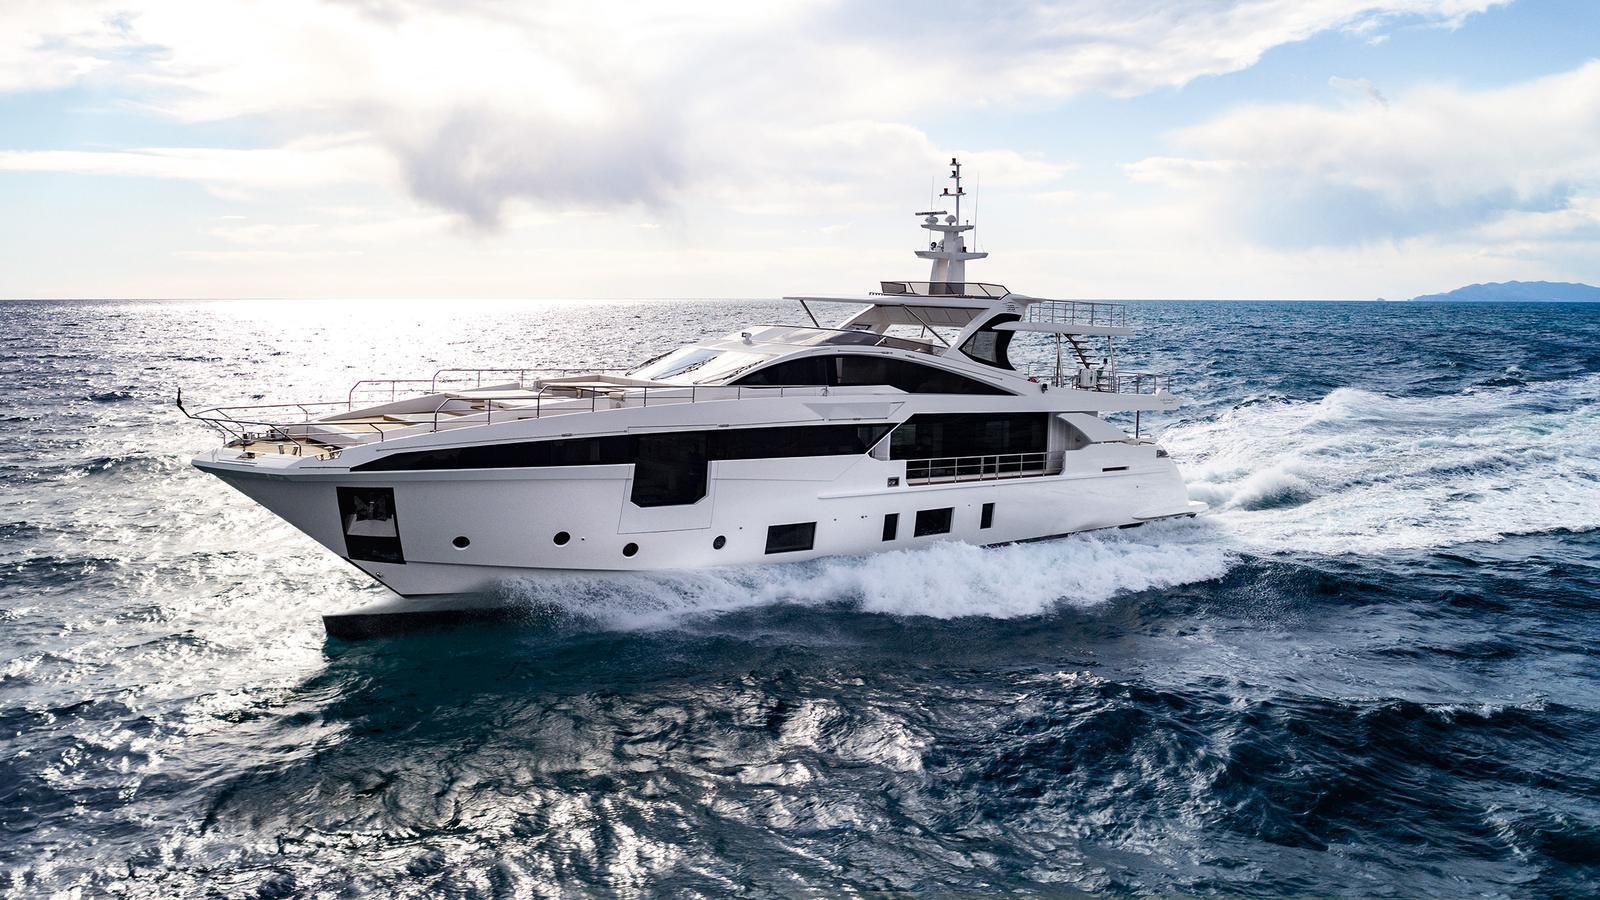 Grande 35 Metri motoryacht azimut yachts 35m 2019 half profile sistership